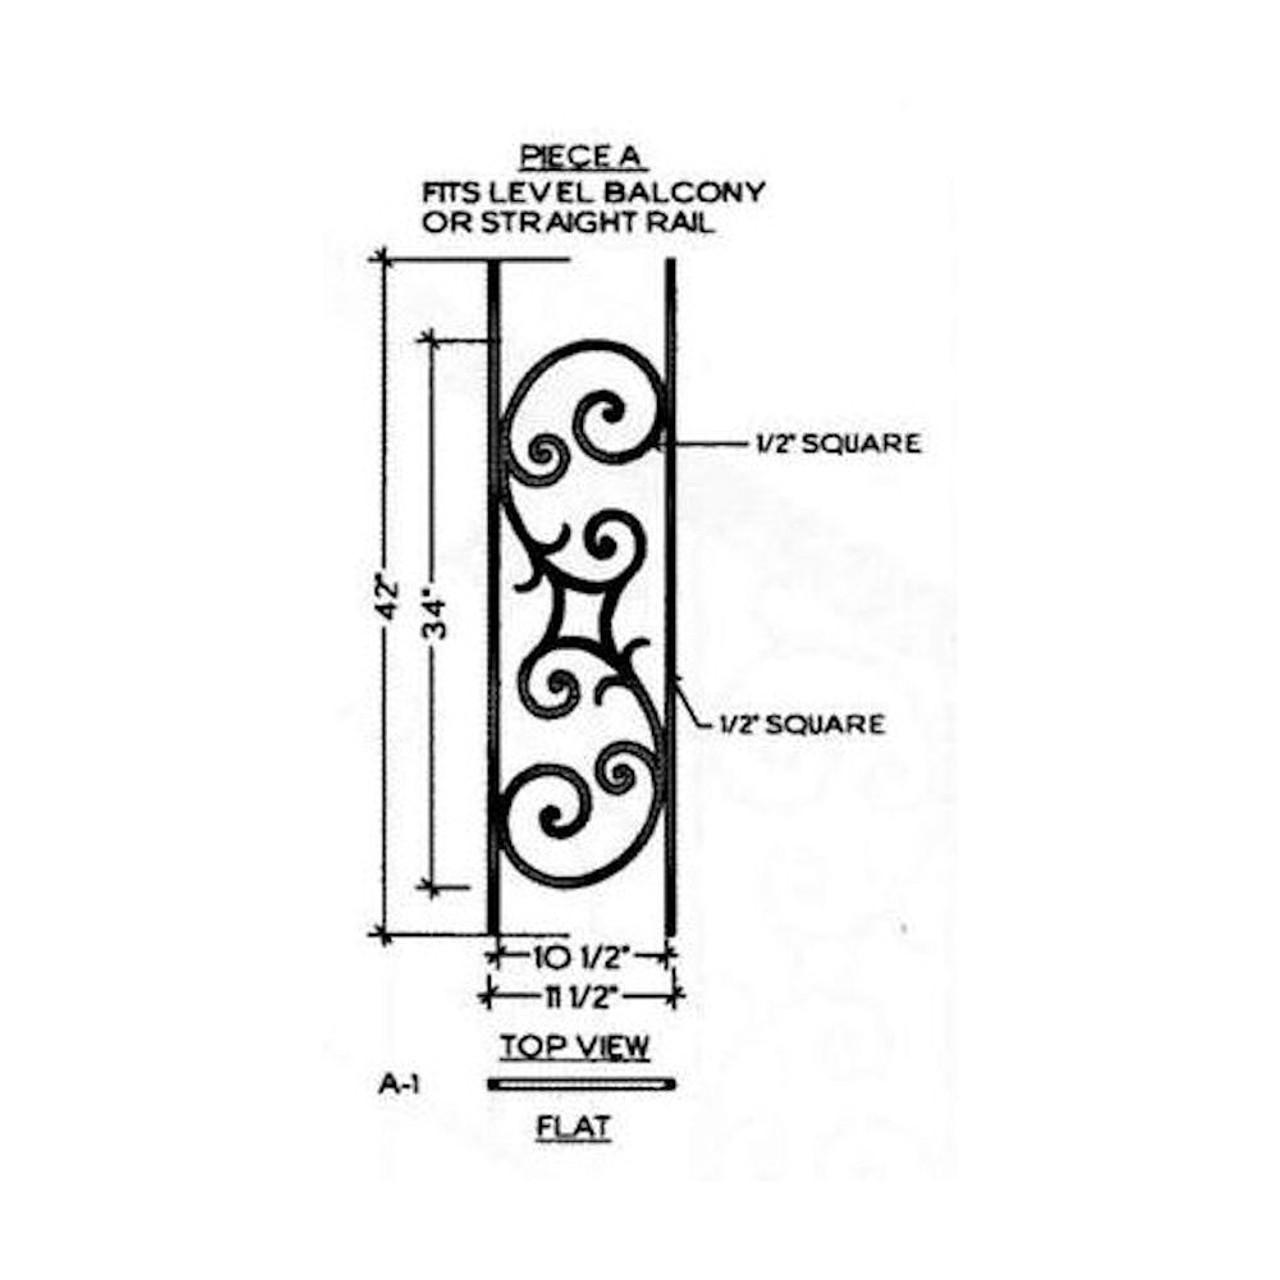 HFSE.A1 Seville Iron Baluster Panel for Level Balcony or Straight balustrade runs